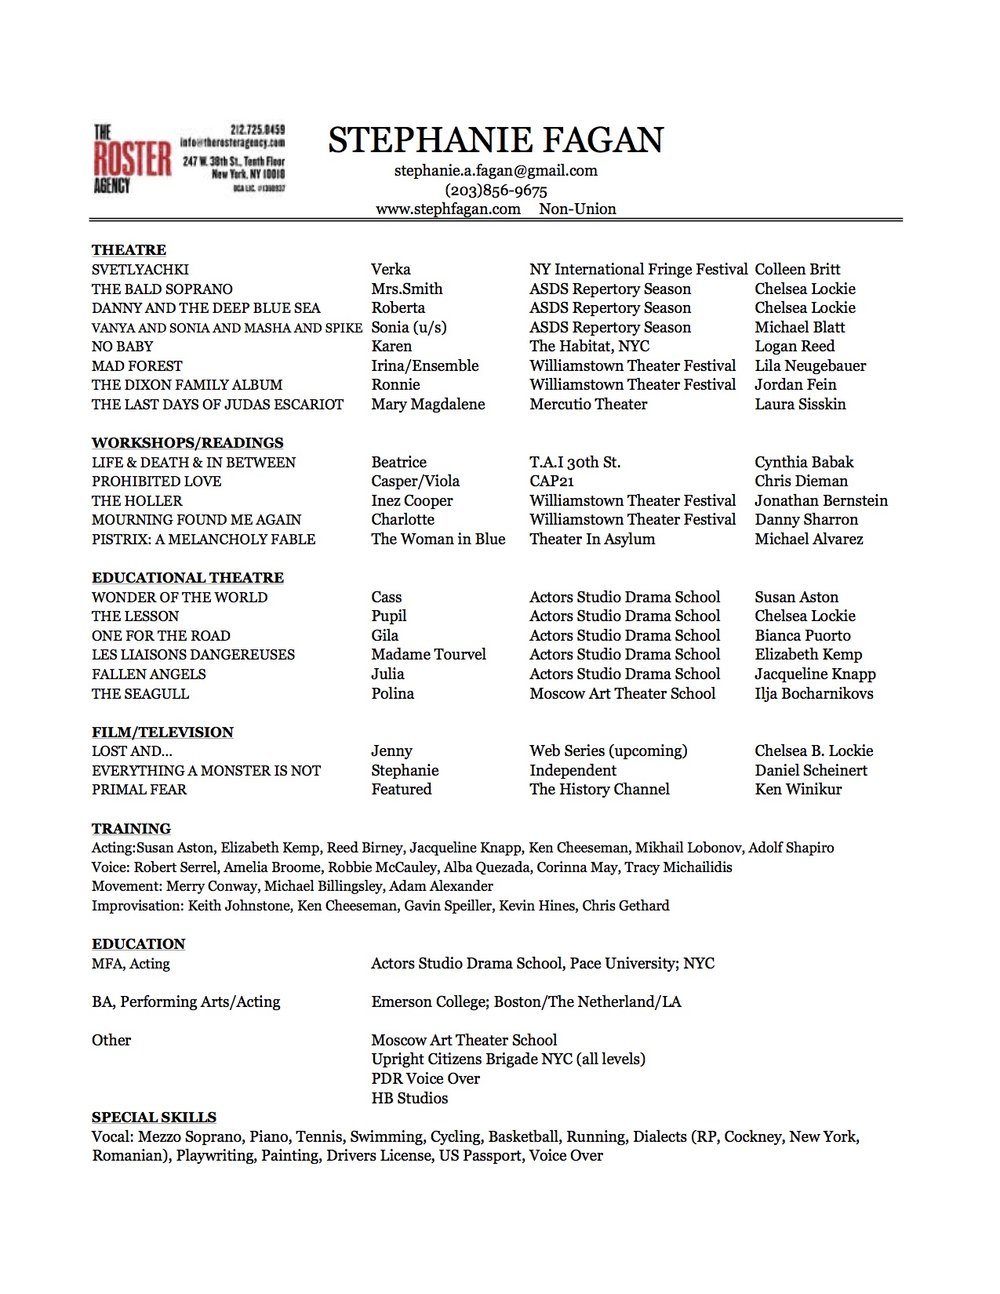 Stephanie Fagan Acting Resume.jpg